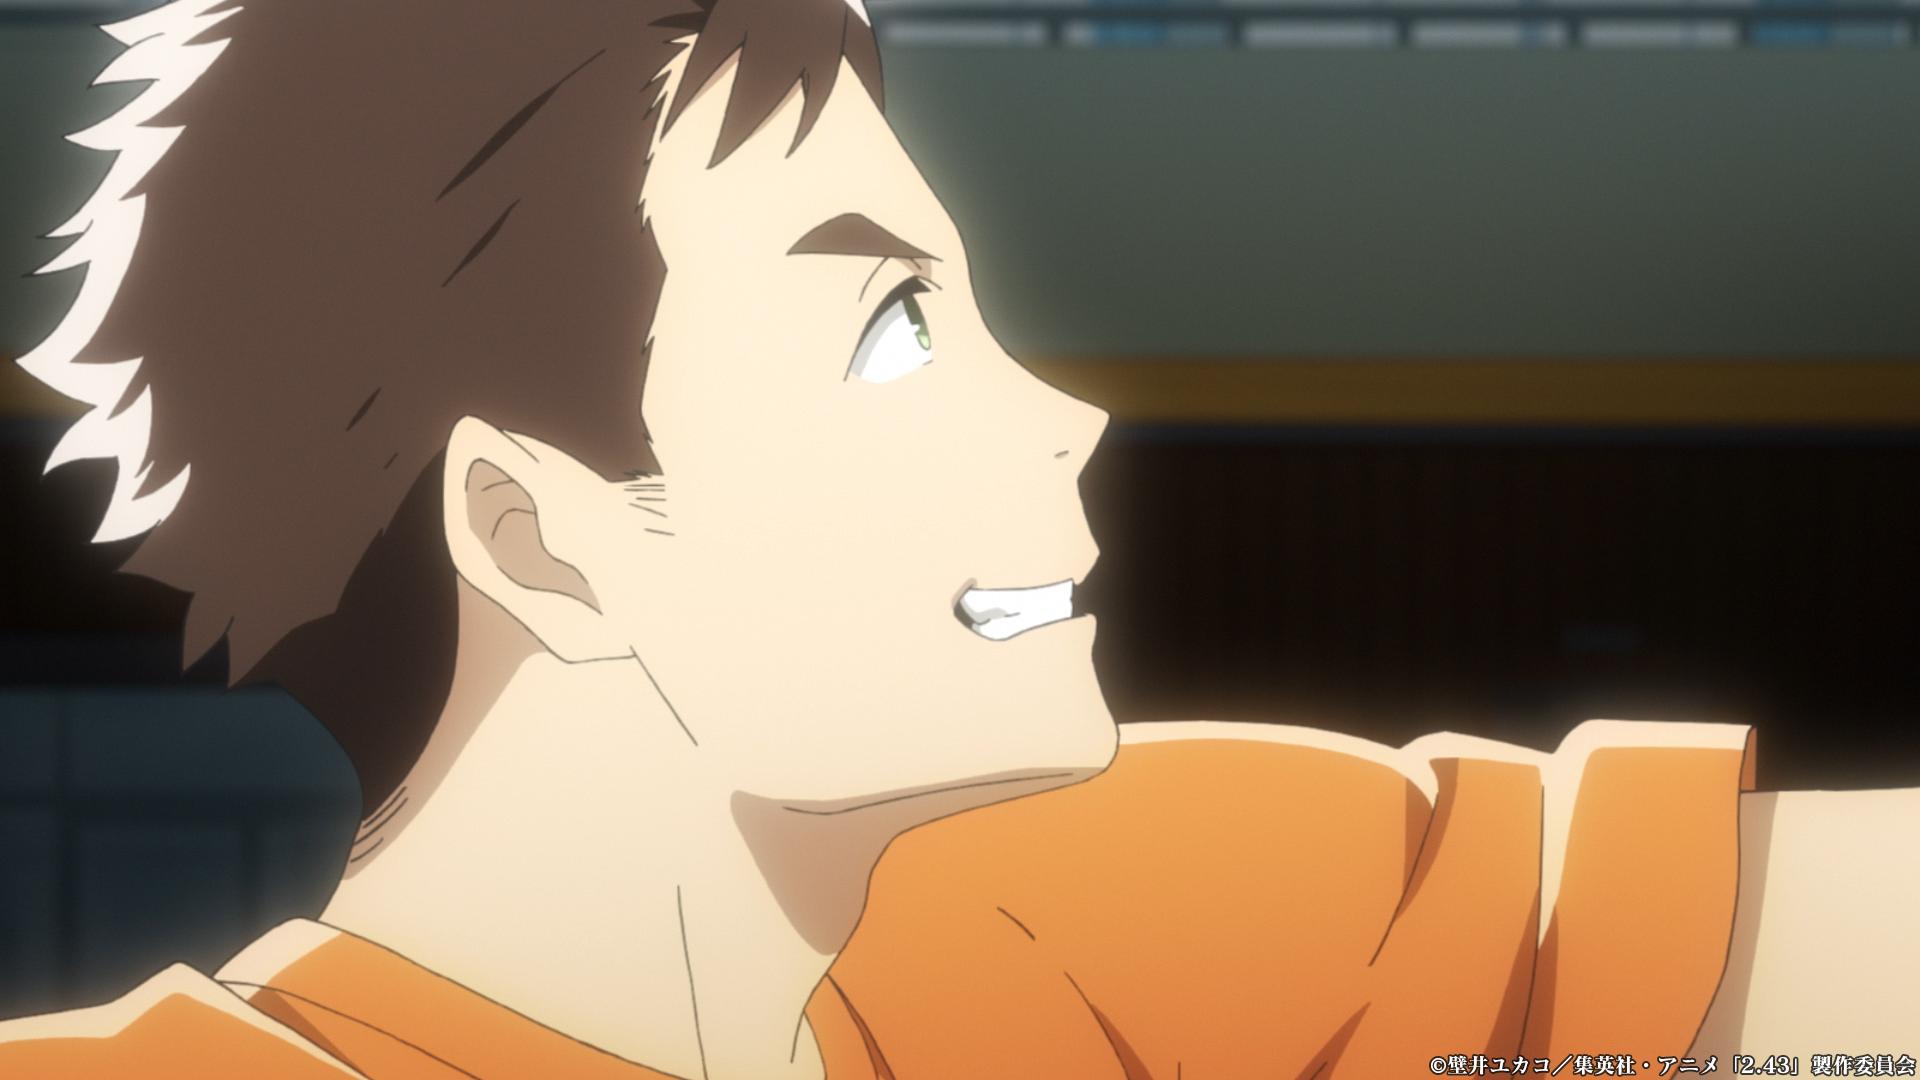 TVアニメ「2.43清陰高校男子バレー部」第3話「犬の目線とキリンの目線」感想